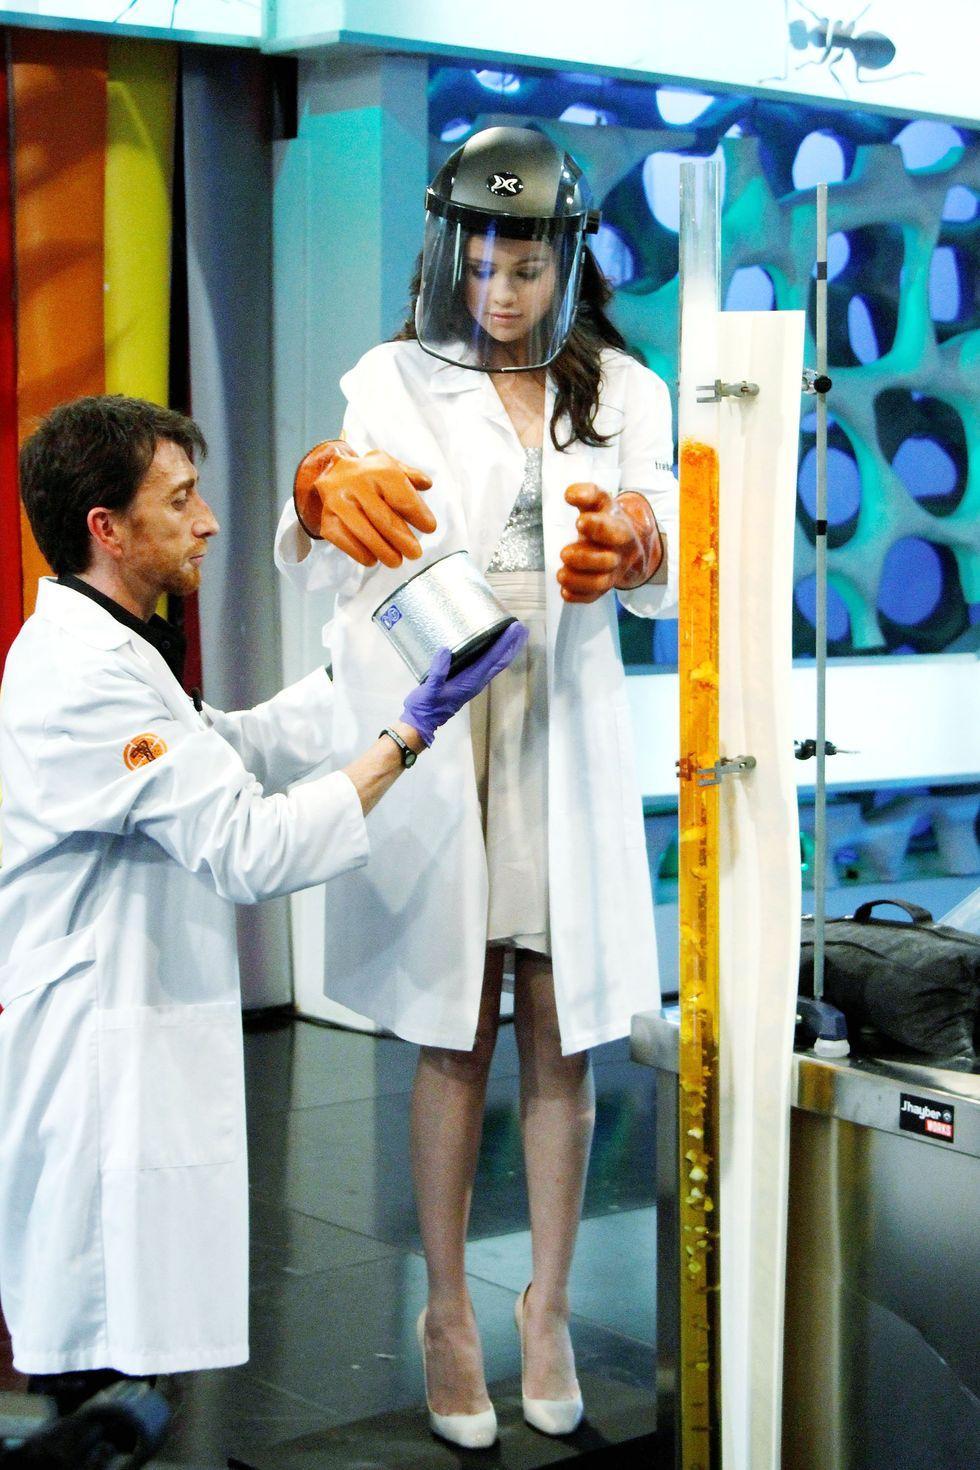 Selena Gomez 2010 : selena-gomez-el-hormiguero-tv-show-stills-hq-12